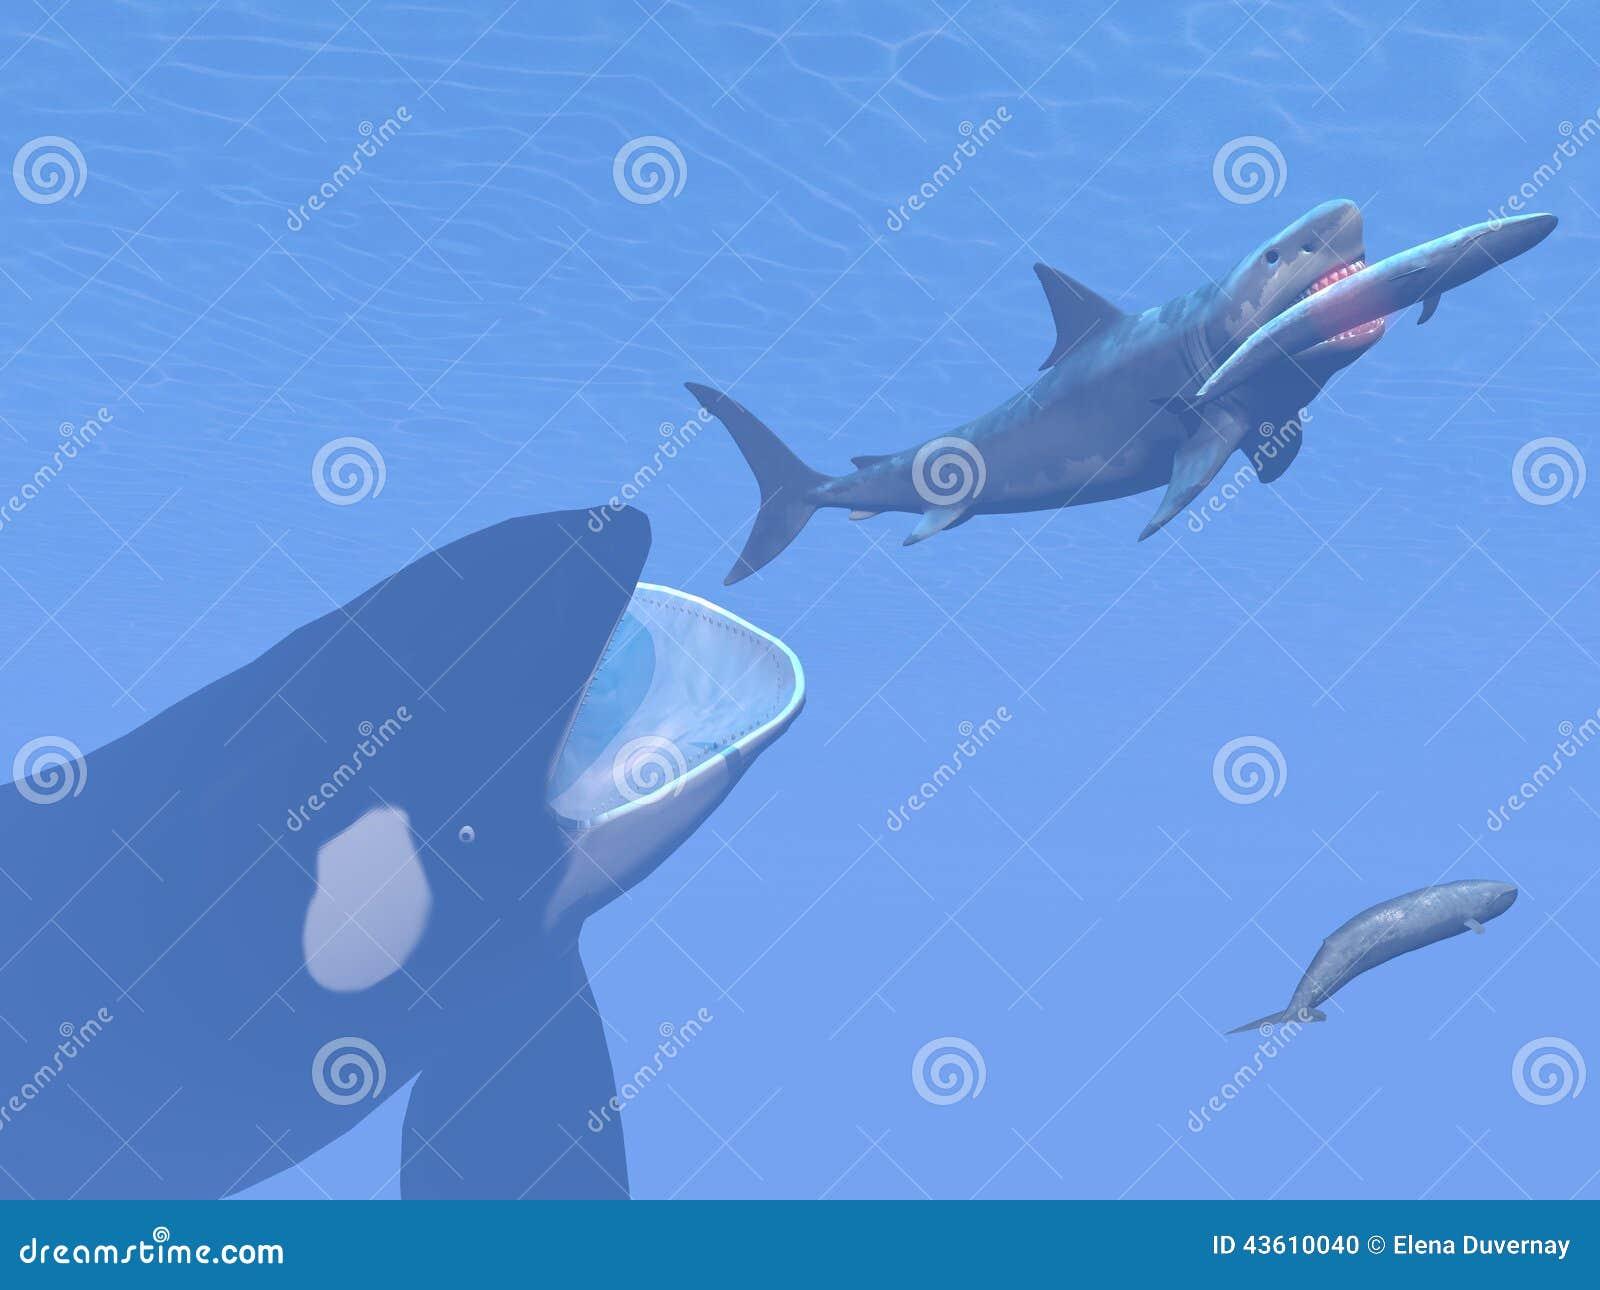 ... killer whale attacking small megalodon shark eating blue whale - 3D